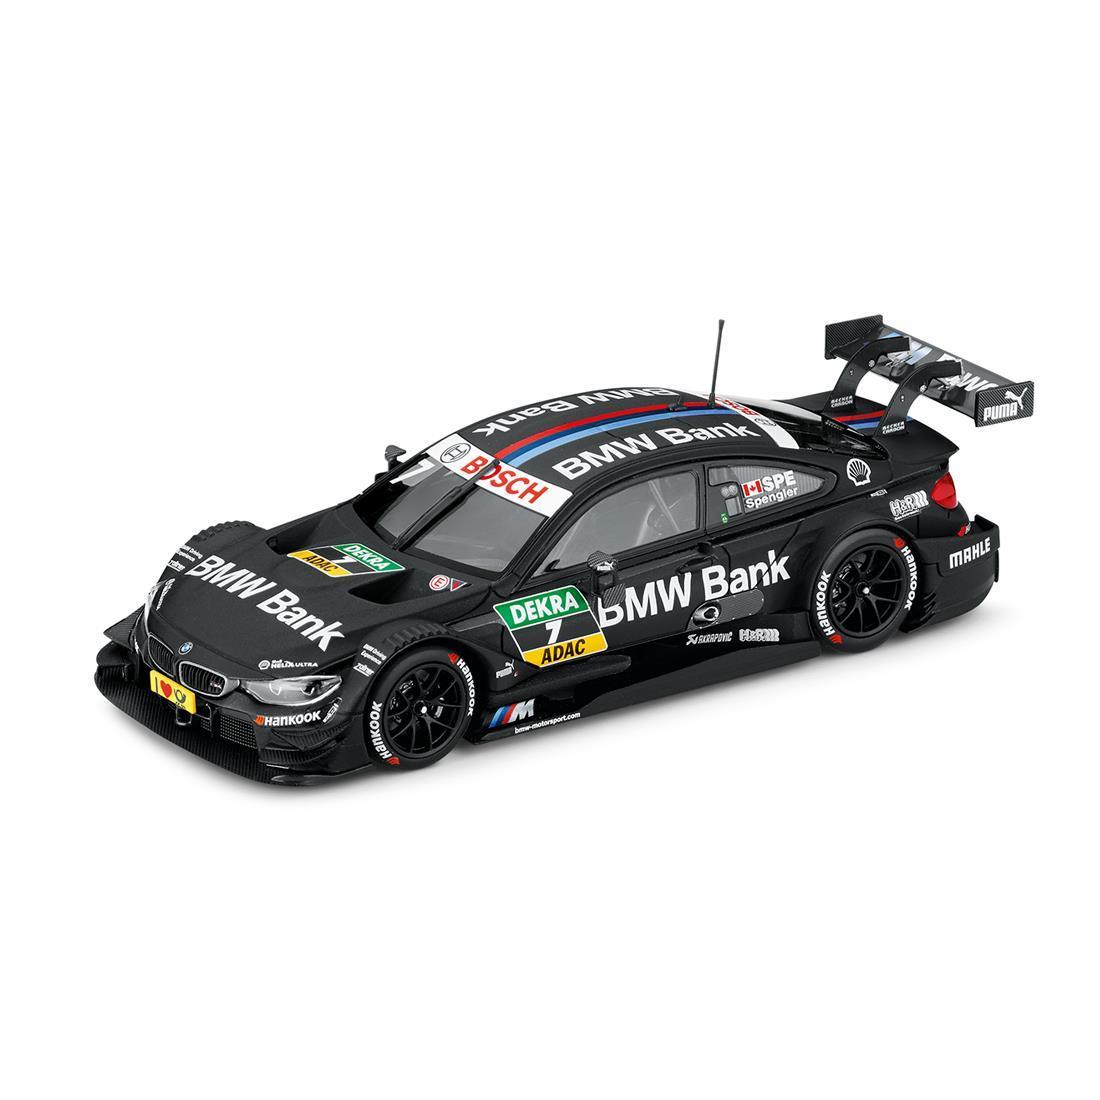 BMW miniature M4 DTM 2016 1:18 – DTM Team BMW Bank